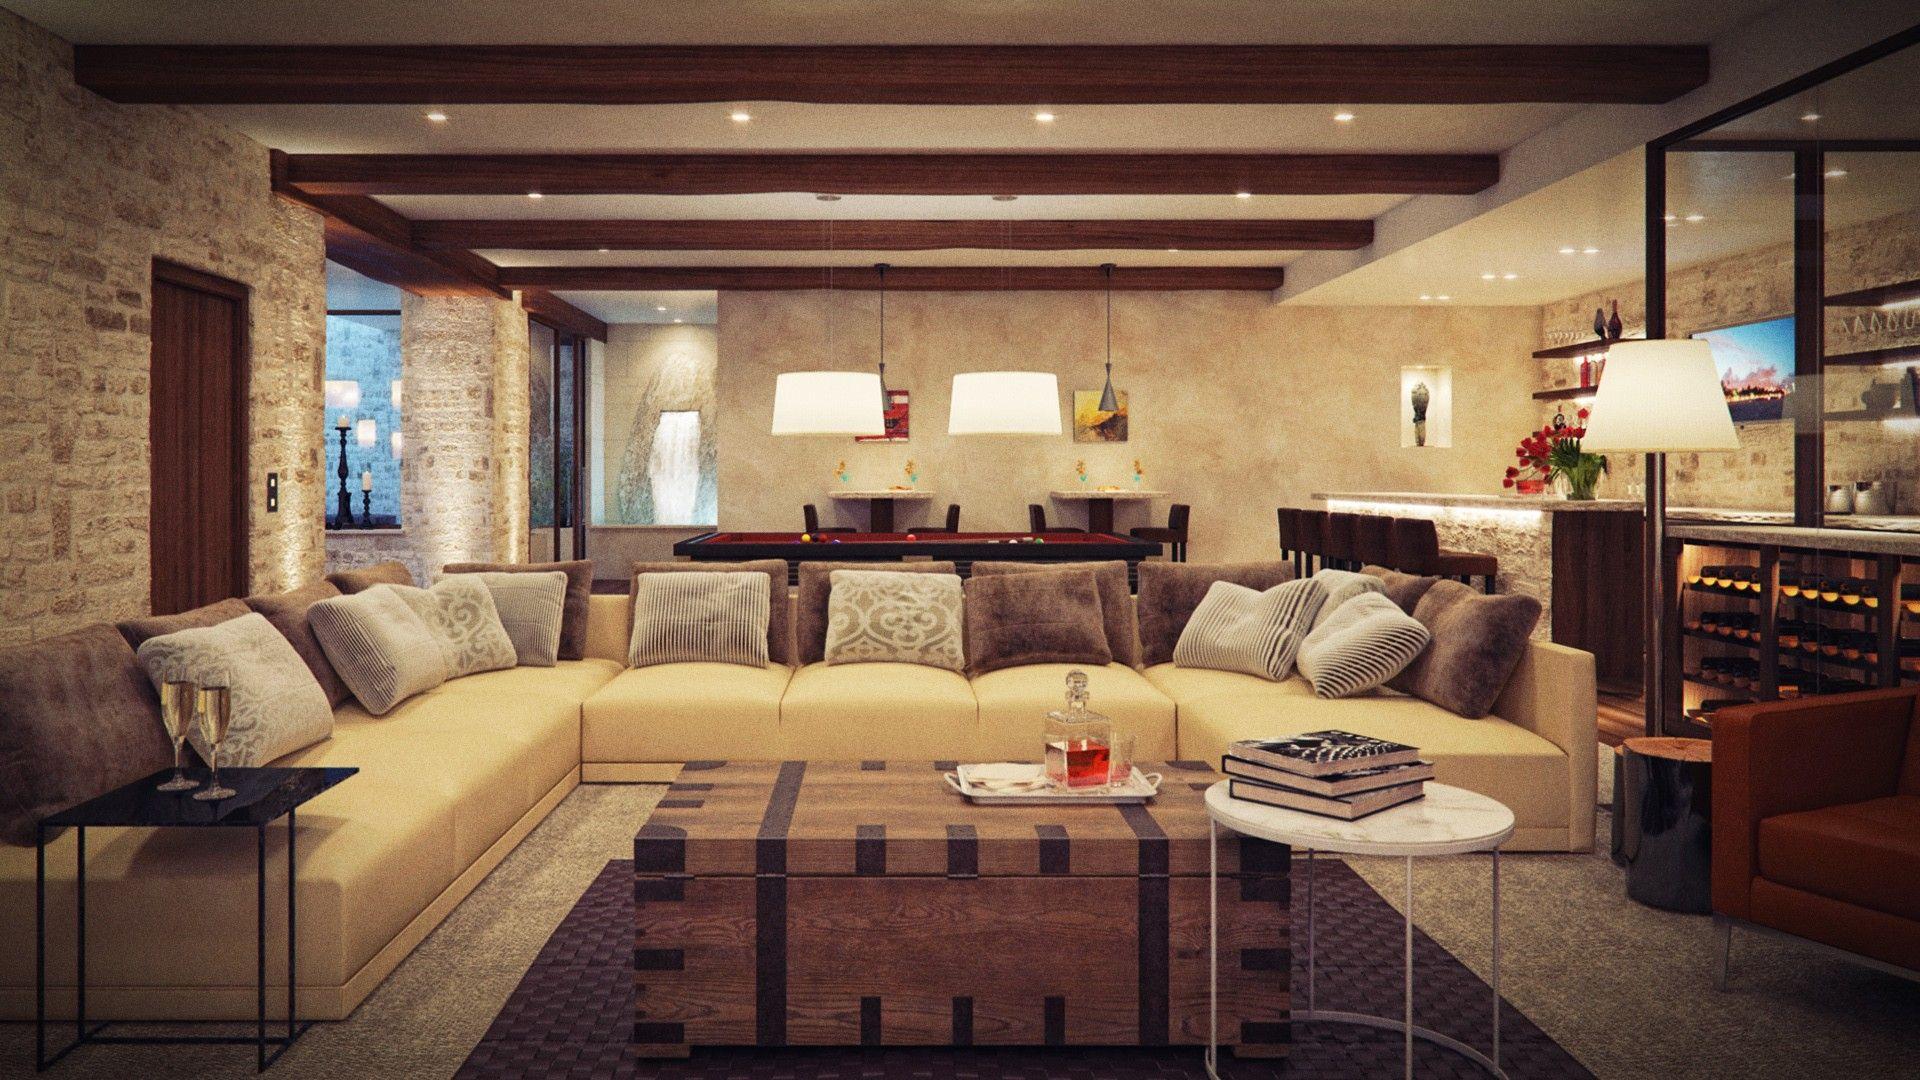 Modern Rustic Decor modern rustic house interior – modern house